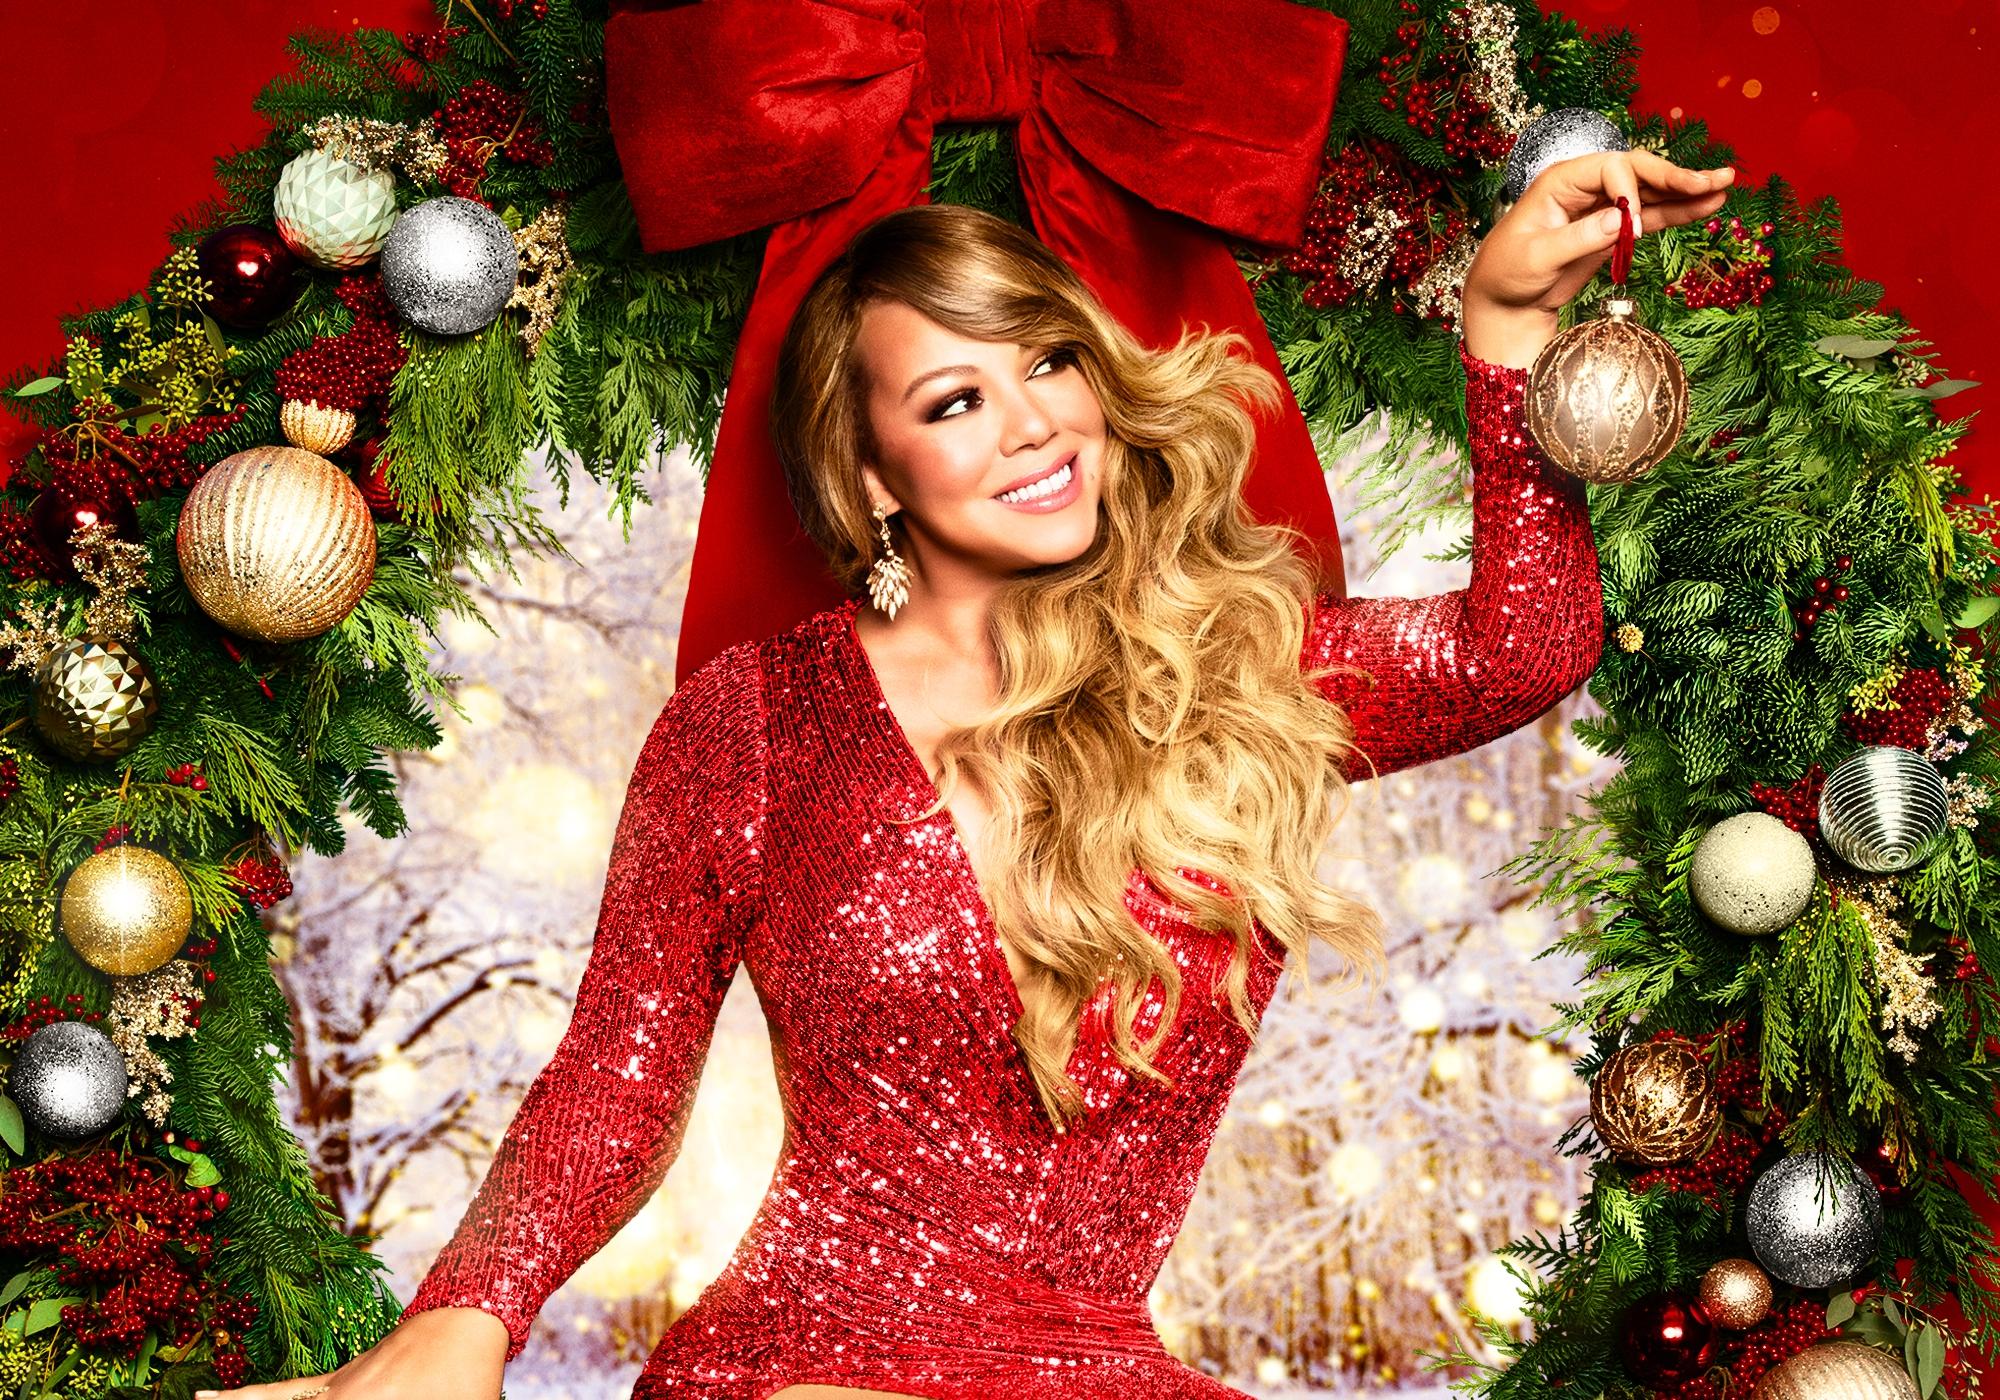 Mariah Carey Christmas Album 2021 Mariah Carey S Apple Tv Plus Christmas Special Gets Date Soundtrack Variety